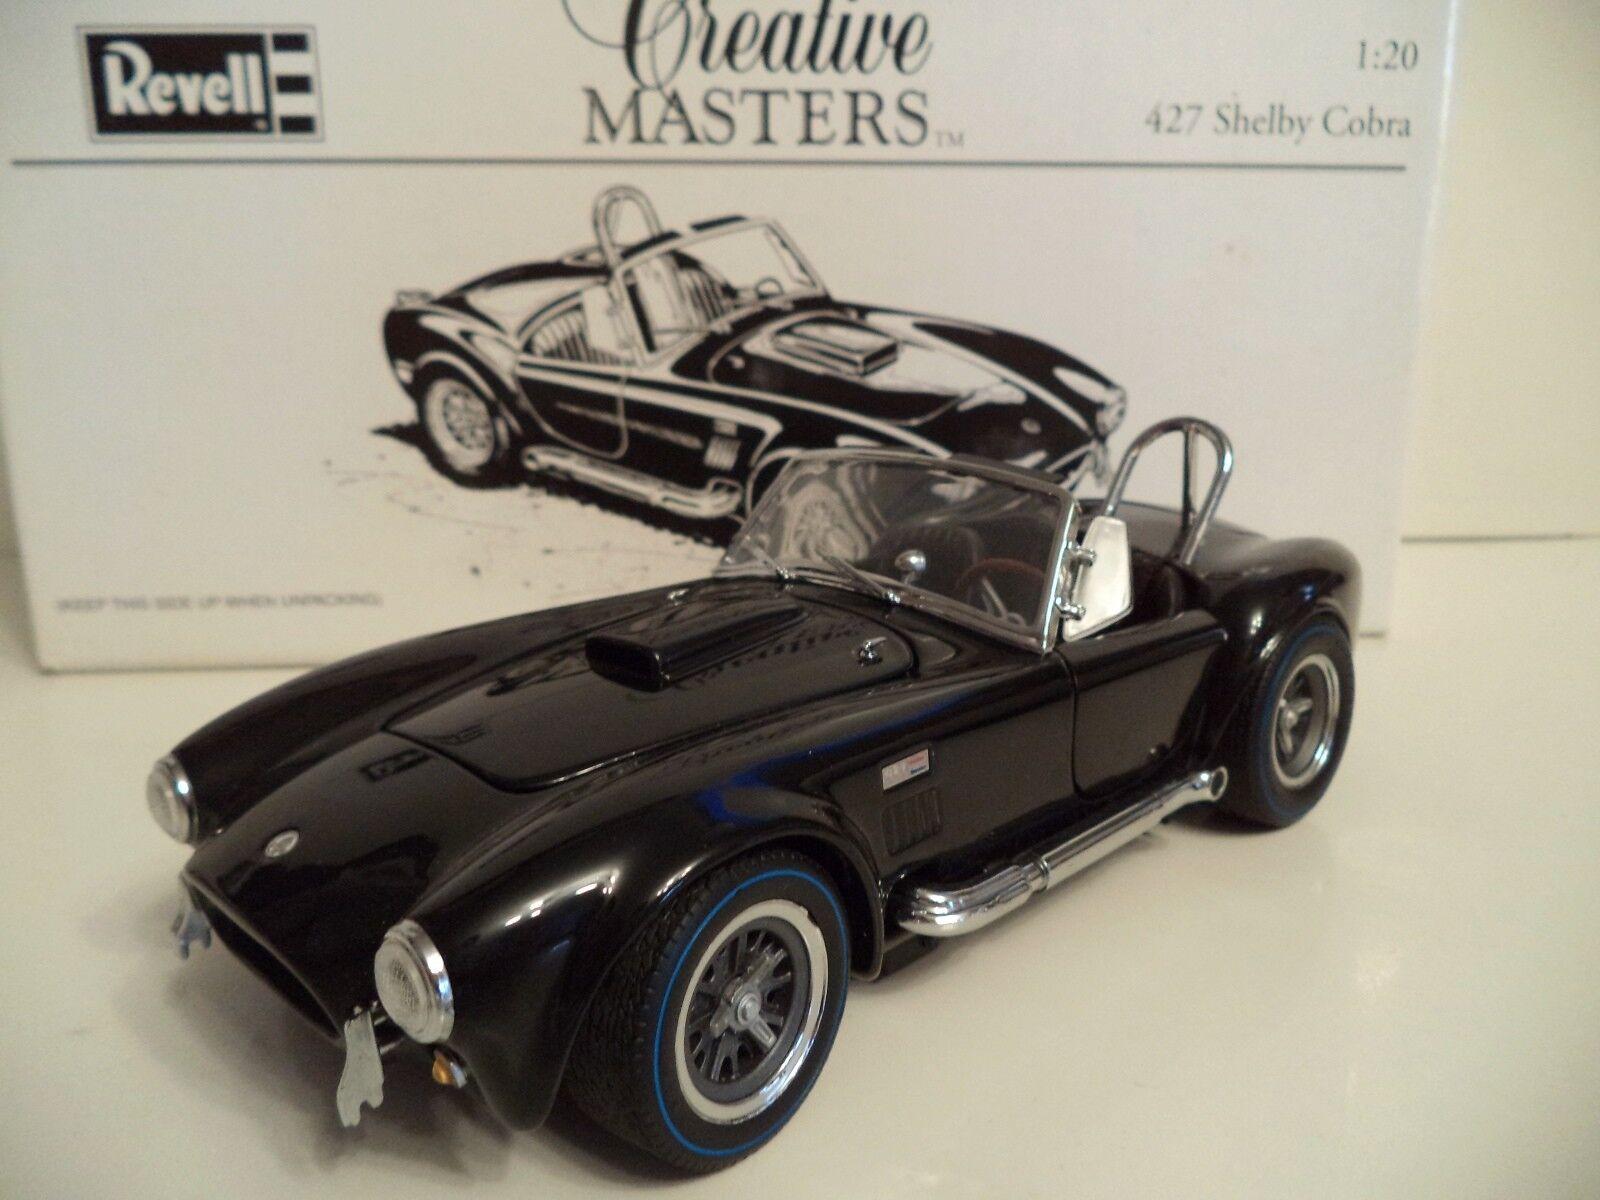 REVELL Creative Masters Shelby Cobra 427 échelle 1 20 en boîte.